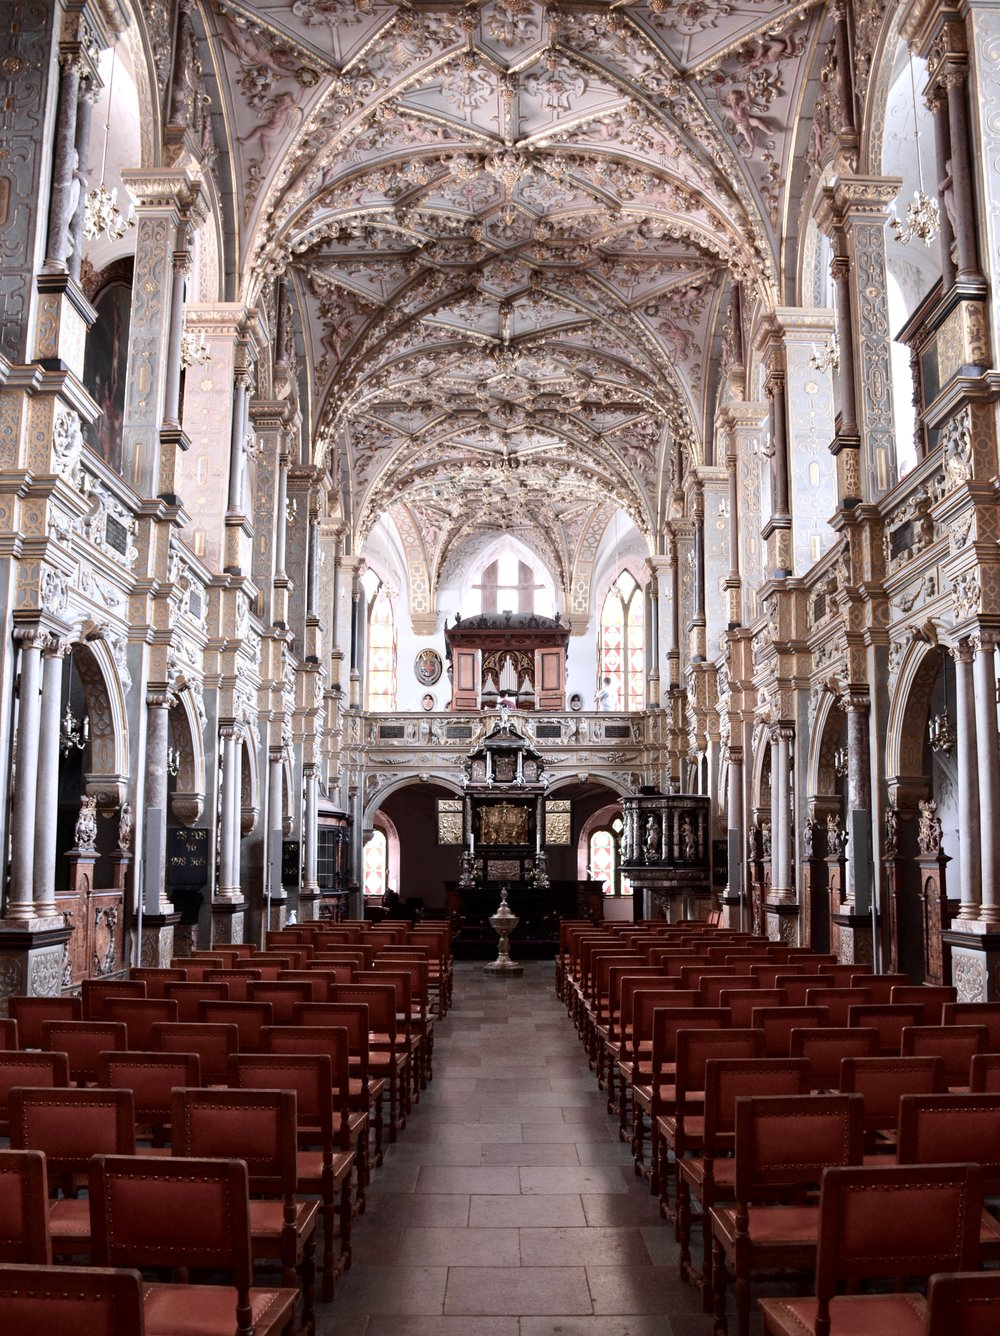 1617 Chapel and 1610 Compenius organ, Frederiksborg Castle, Hillerød, Denmark.